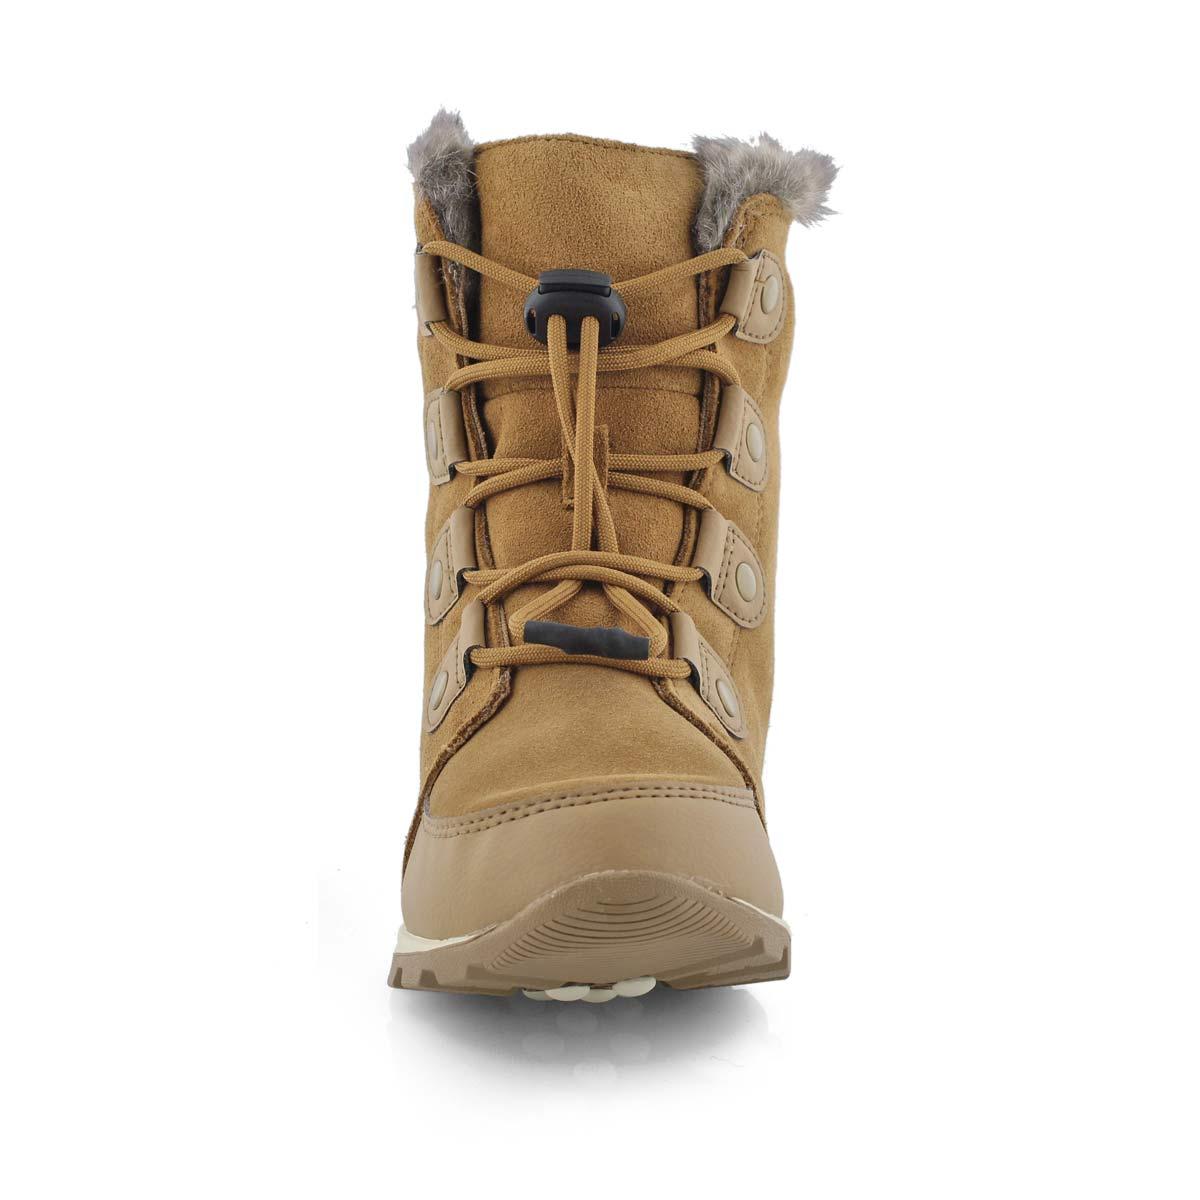 Girls' WHITNEY SUEDE elk waterproof snow boots